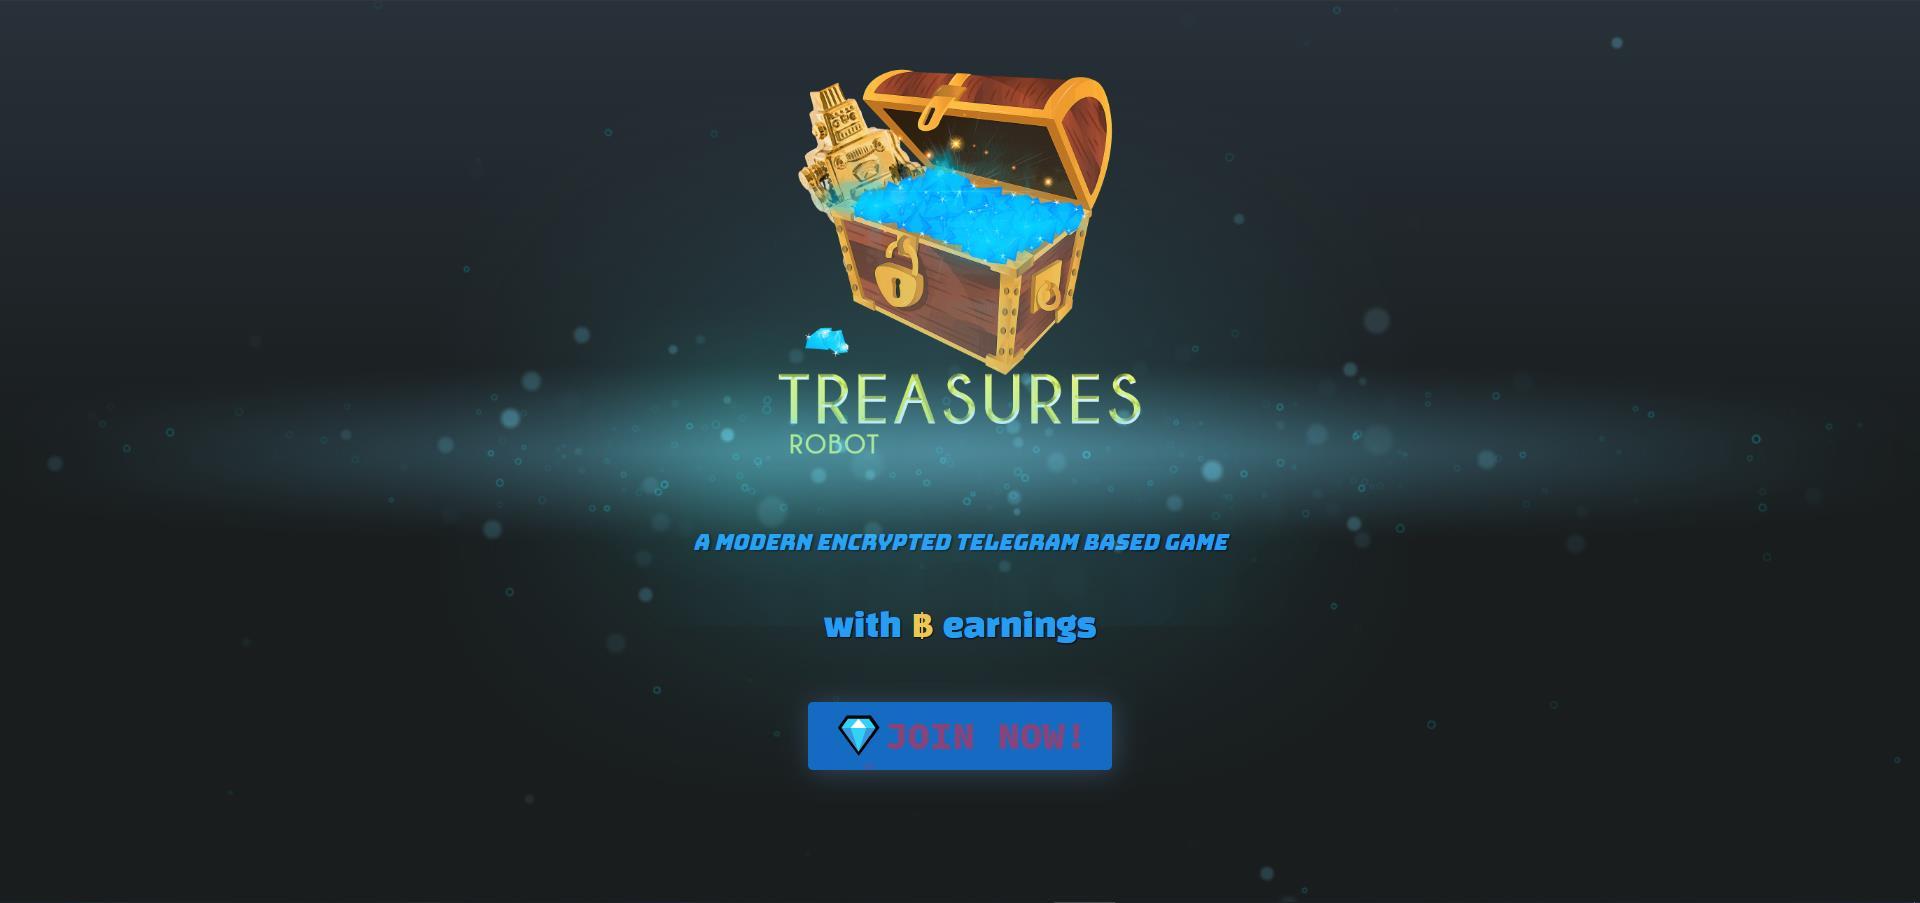 TreasuresBot